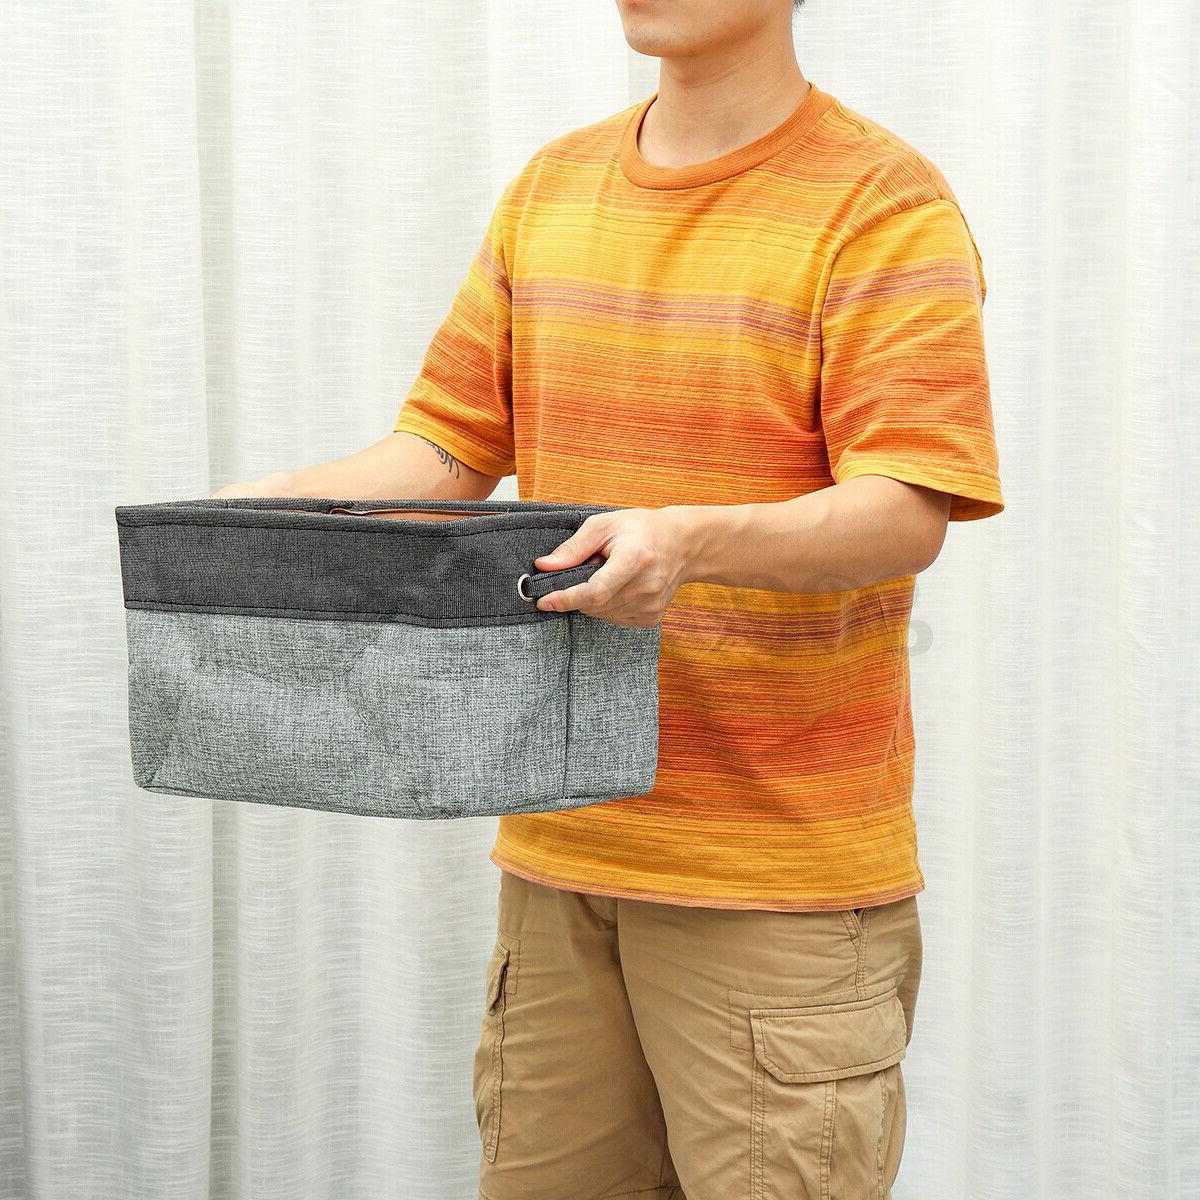 Foldable Washing Clothes Basket Bag Organizer Gery